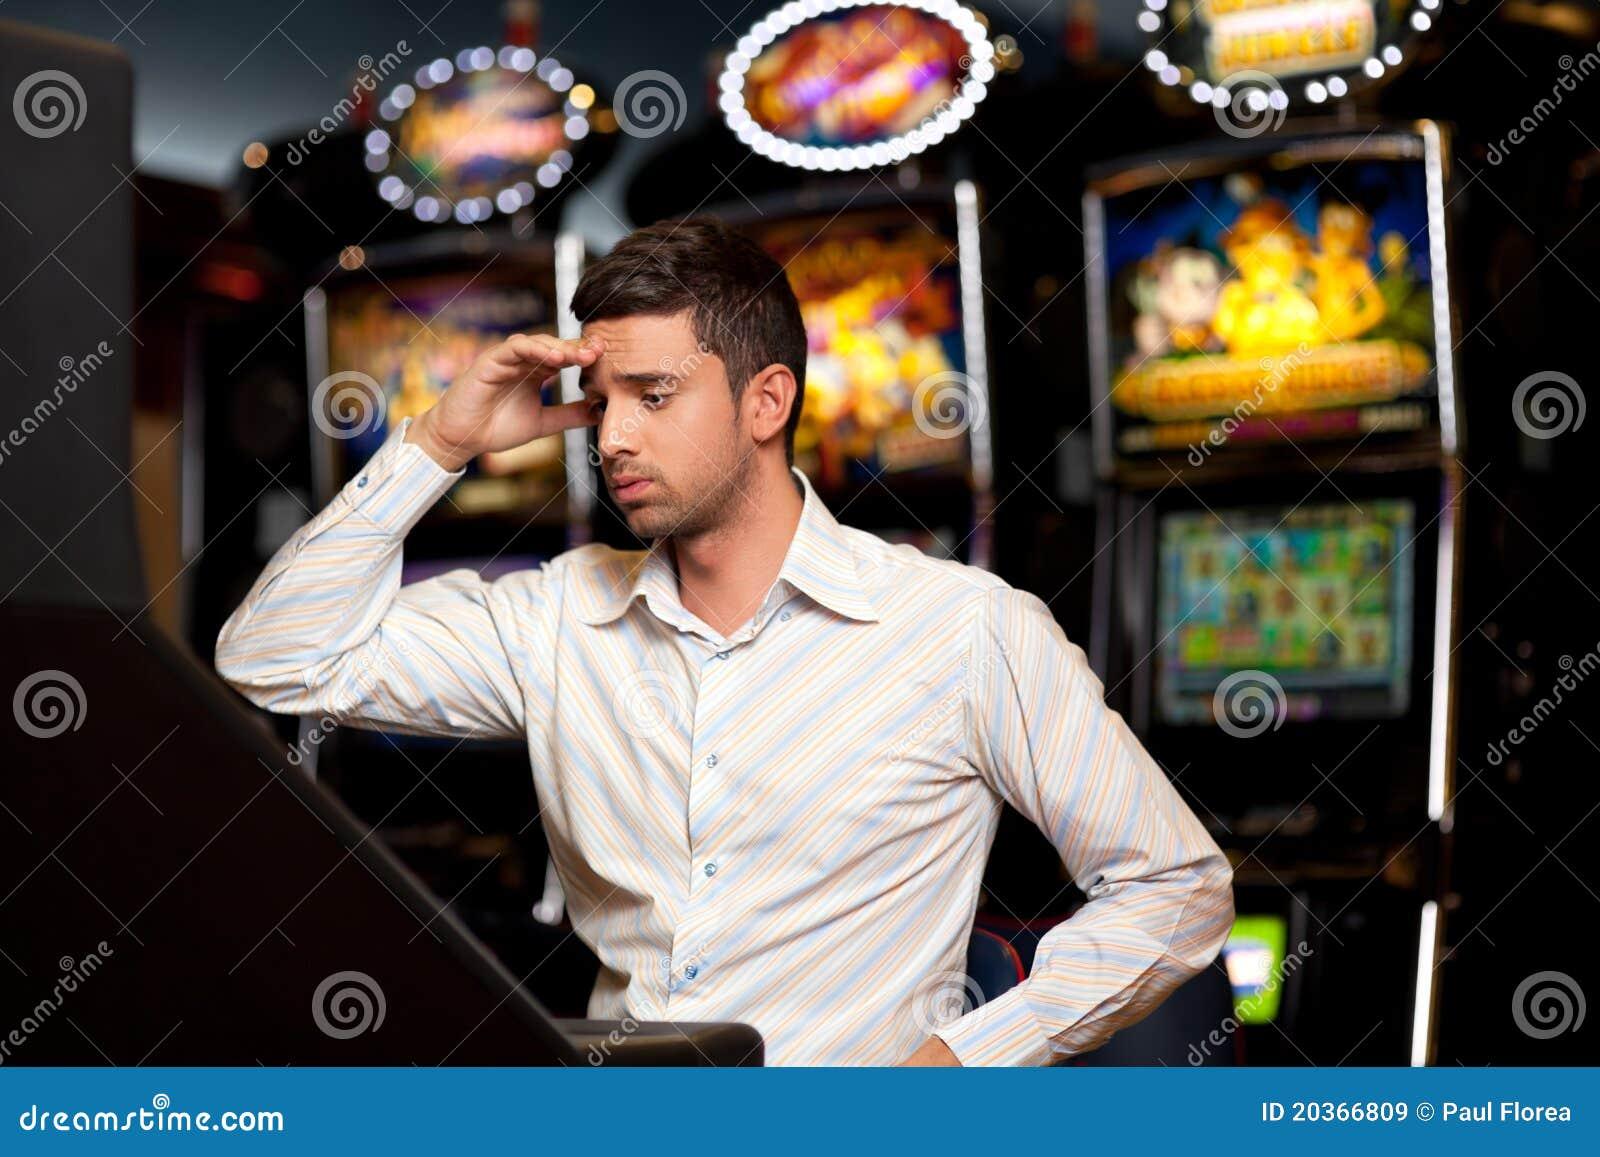 Casino gambling addiction help book casino foxwood guest resort